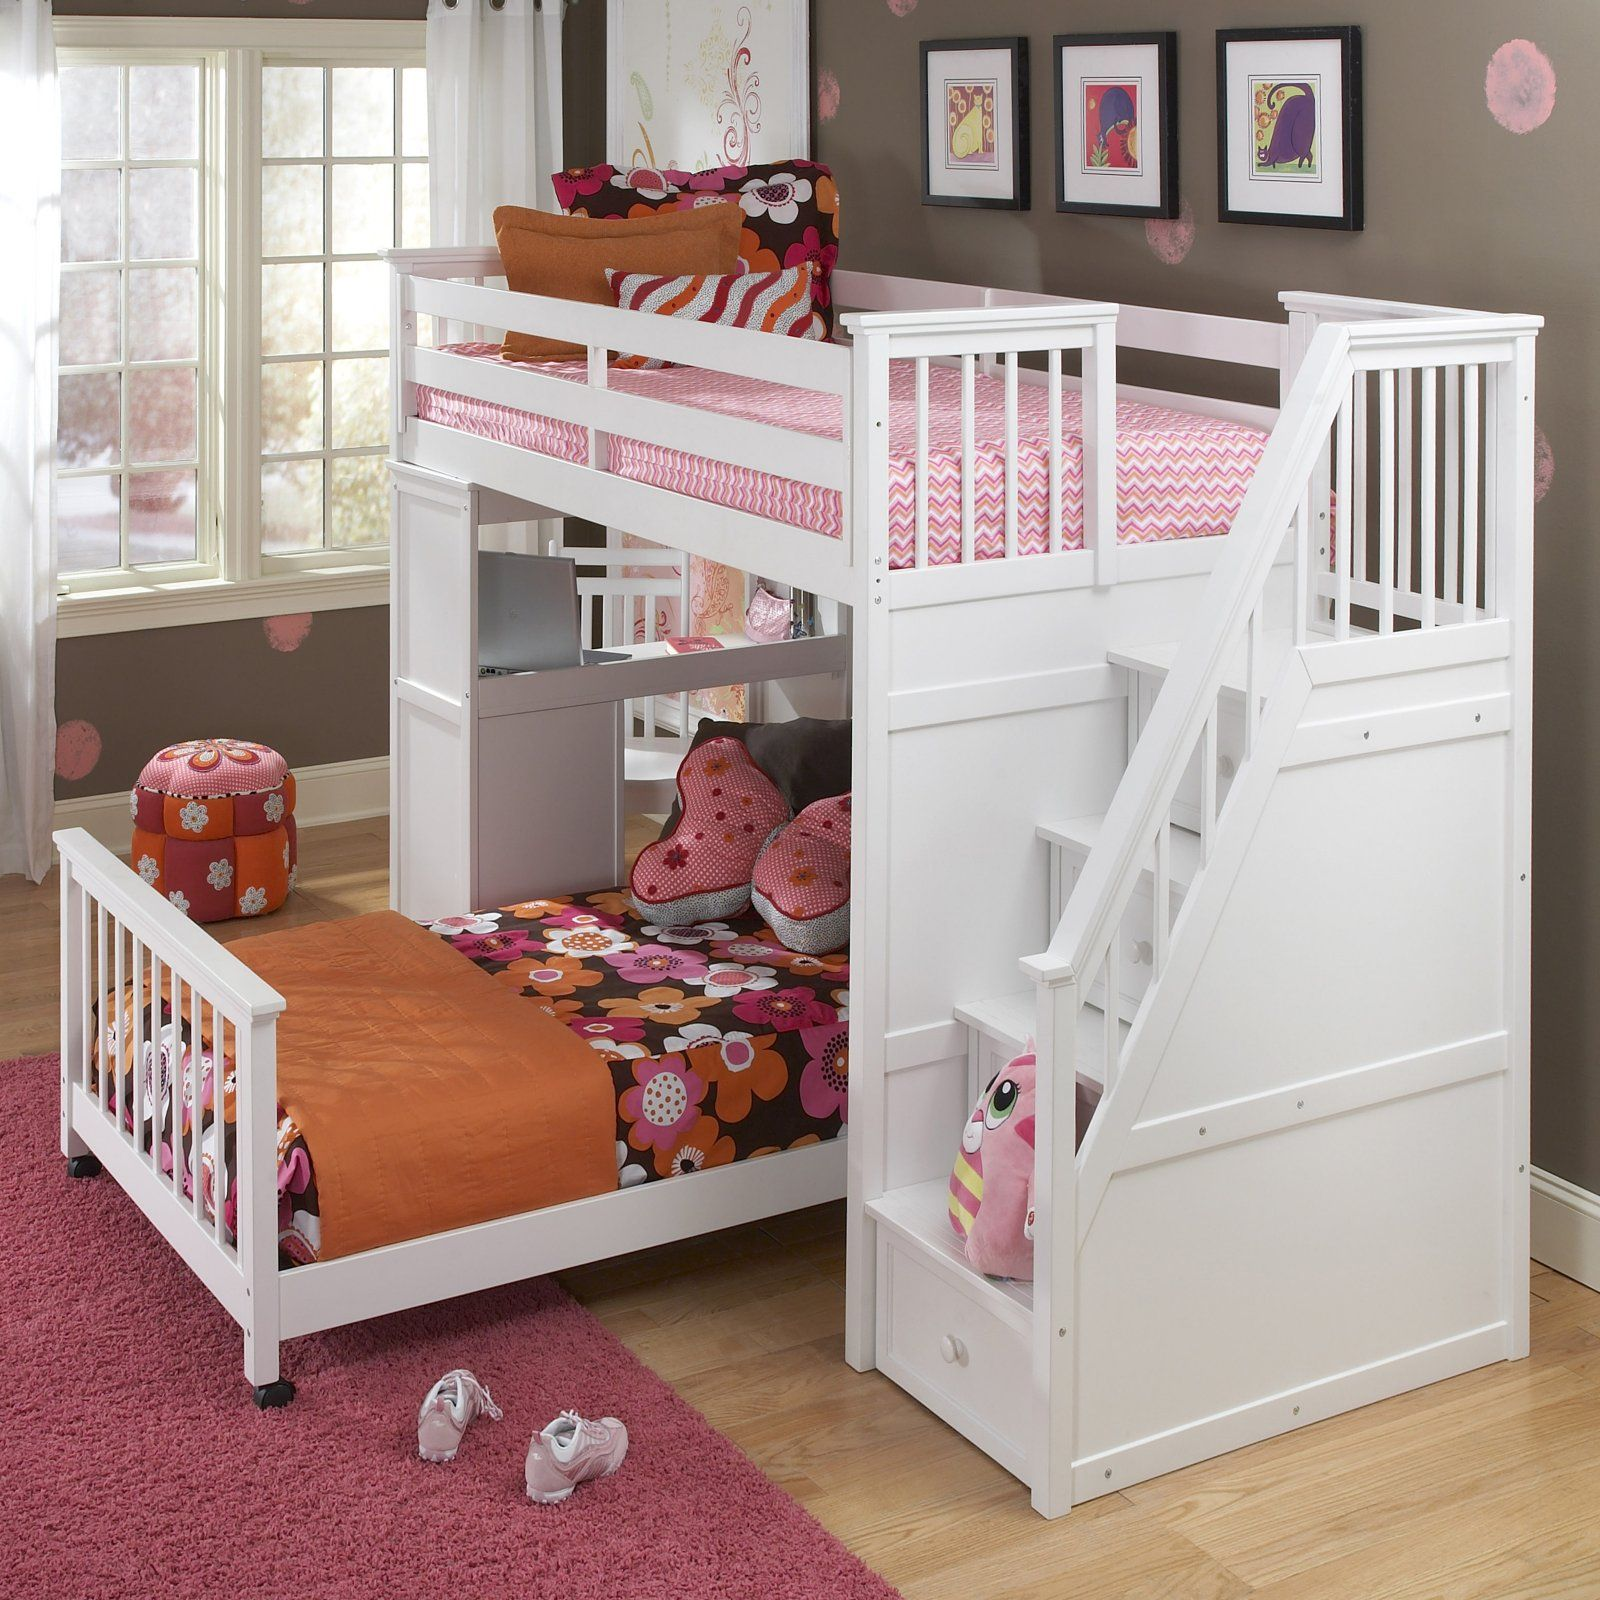 Loft bed with storage stairs  Schoolhouse Stairway Loft Bed  White  Modüler mobilya  Pinterest